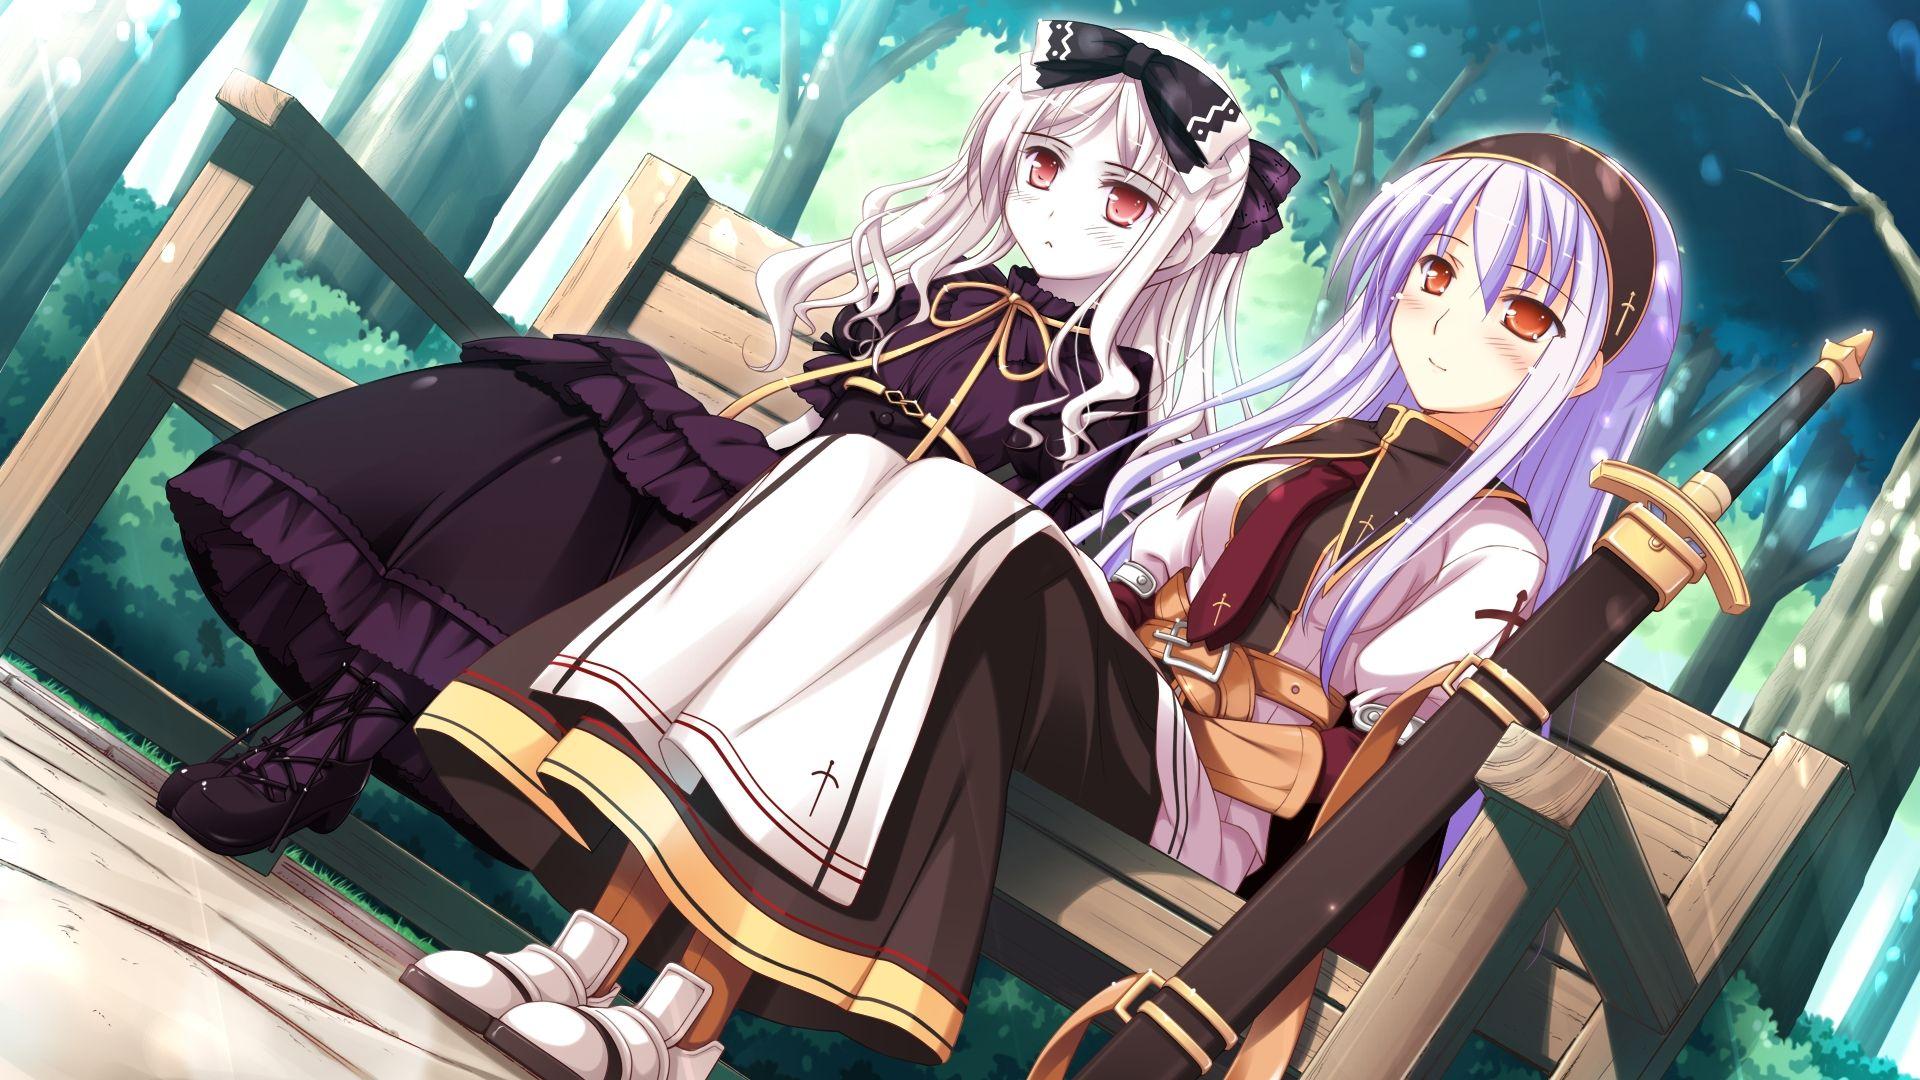 Streaming Anime Osake Wa Fuufu Sub Indo - Animeku